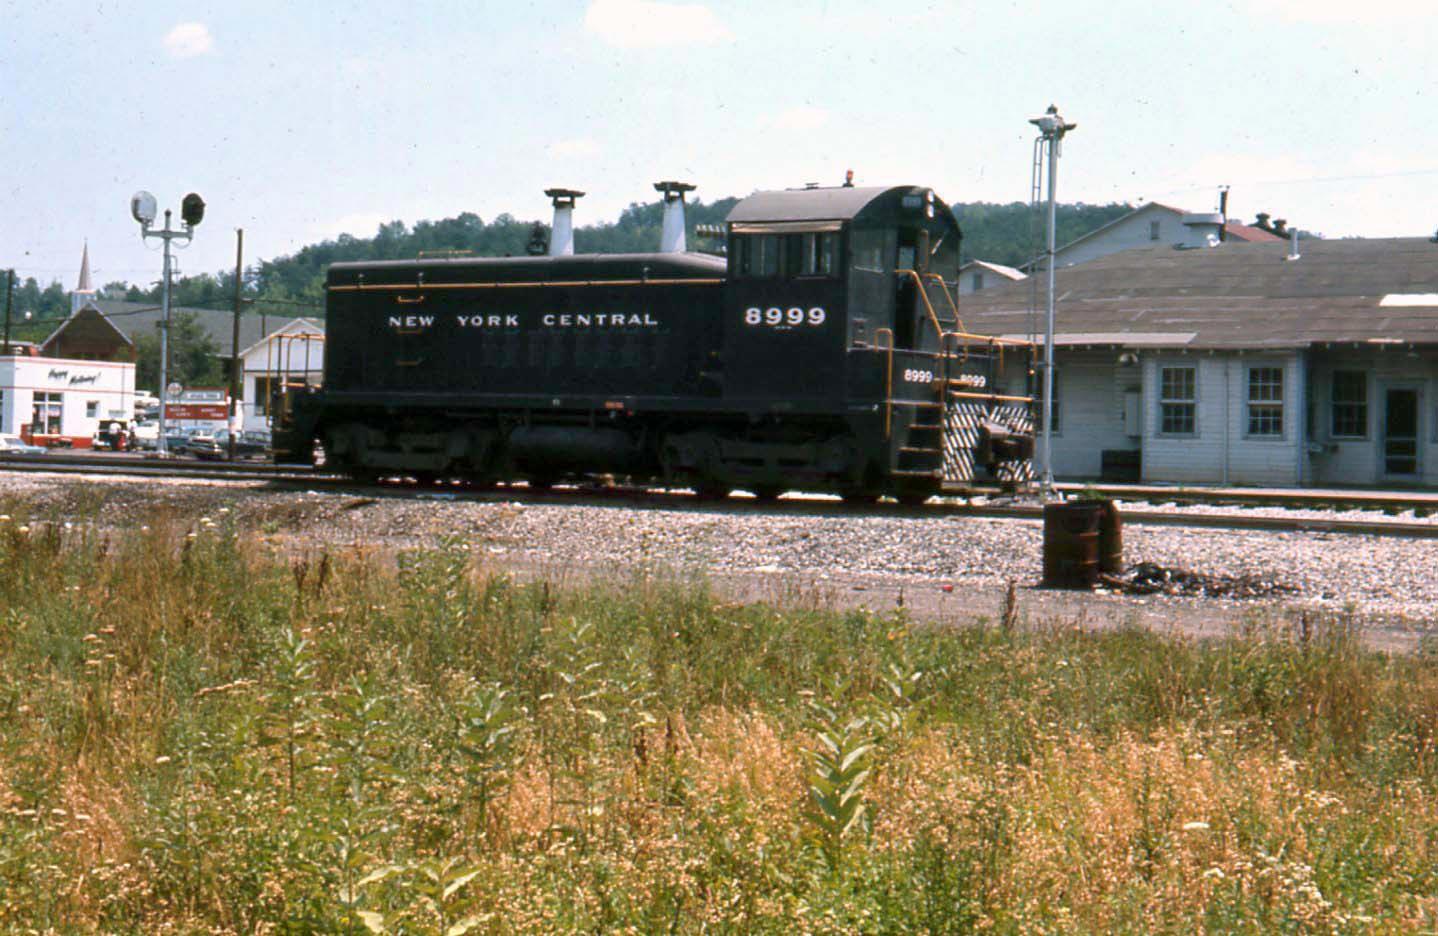 New York Central SW-9 #8999 - Nitro, West Virginia - 1966